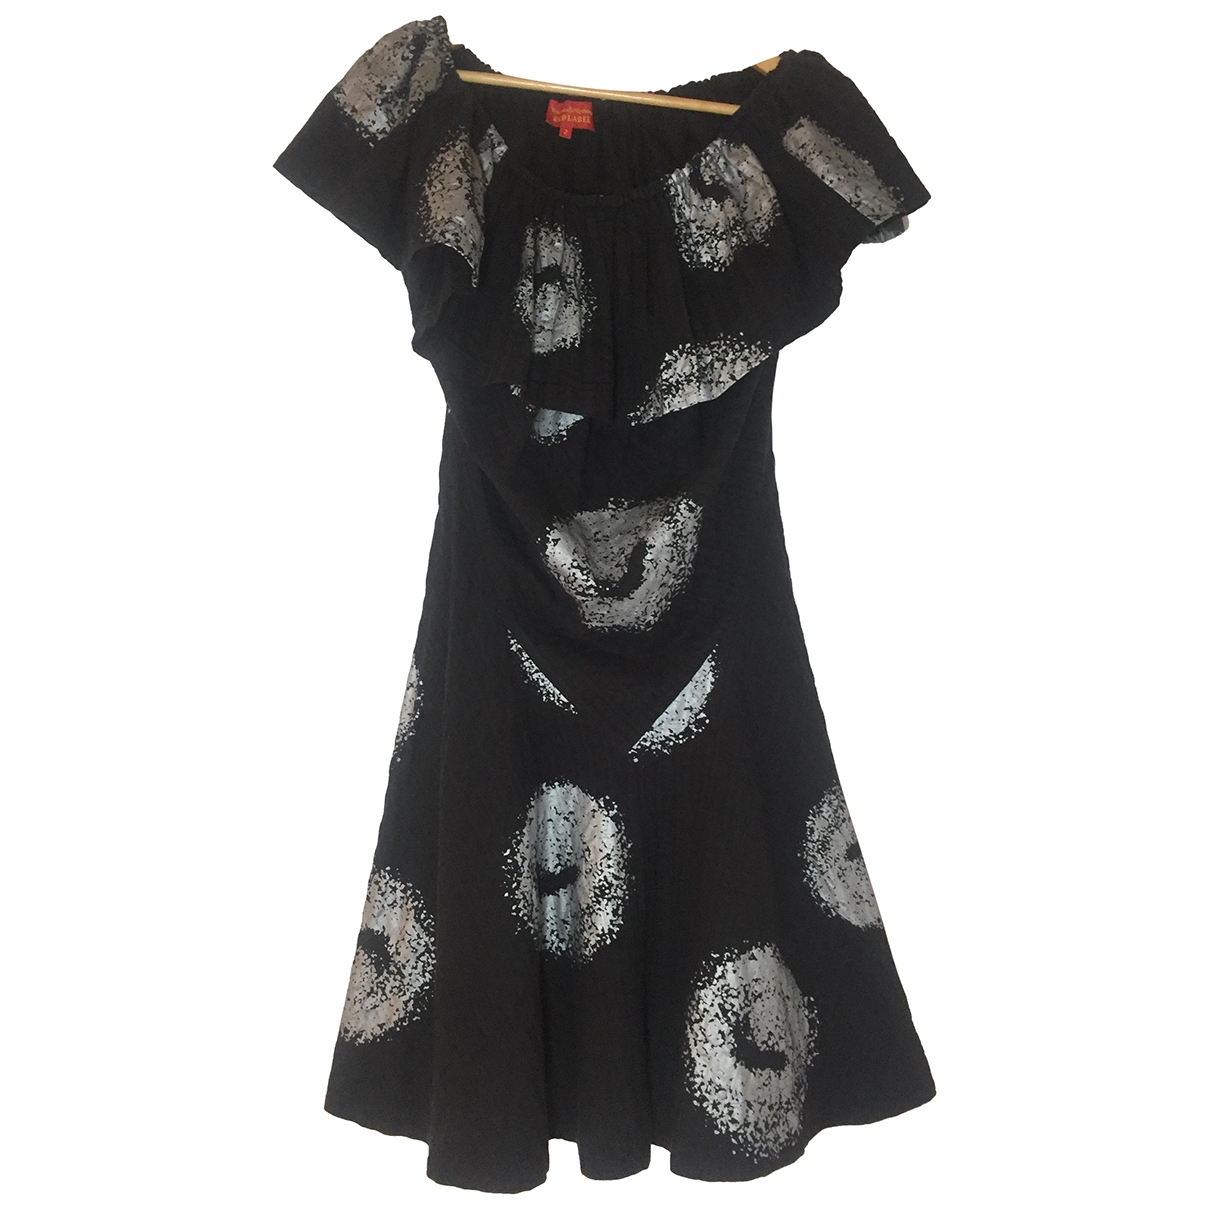 Vivienne Westwood Red Label \N Black Cotton dress for Women 2 0-5